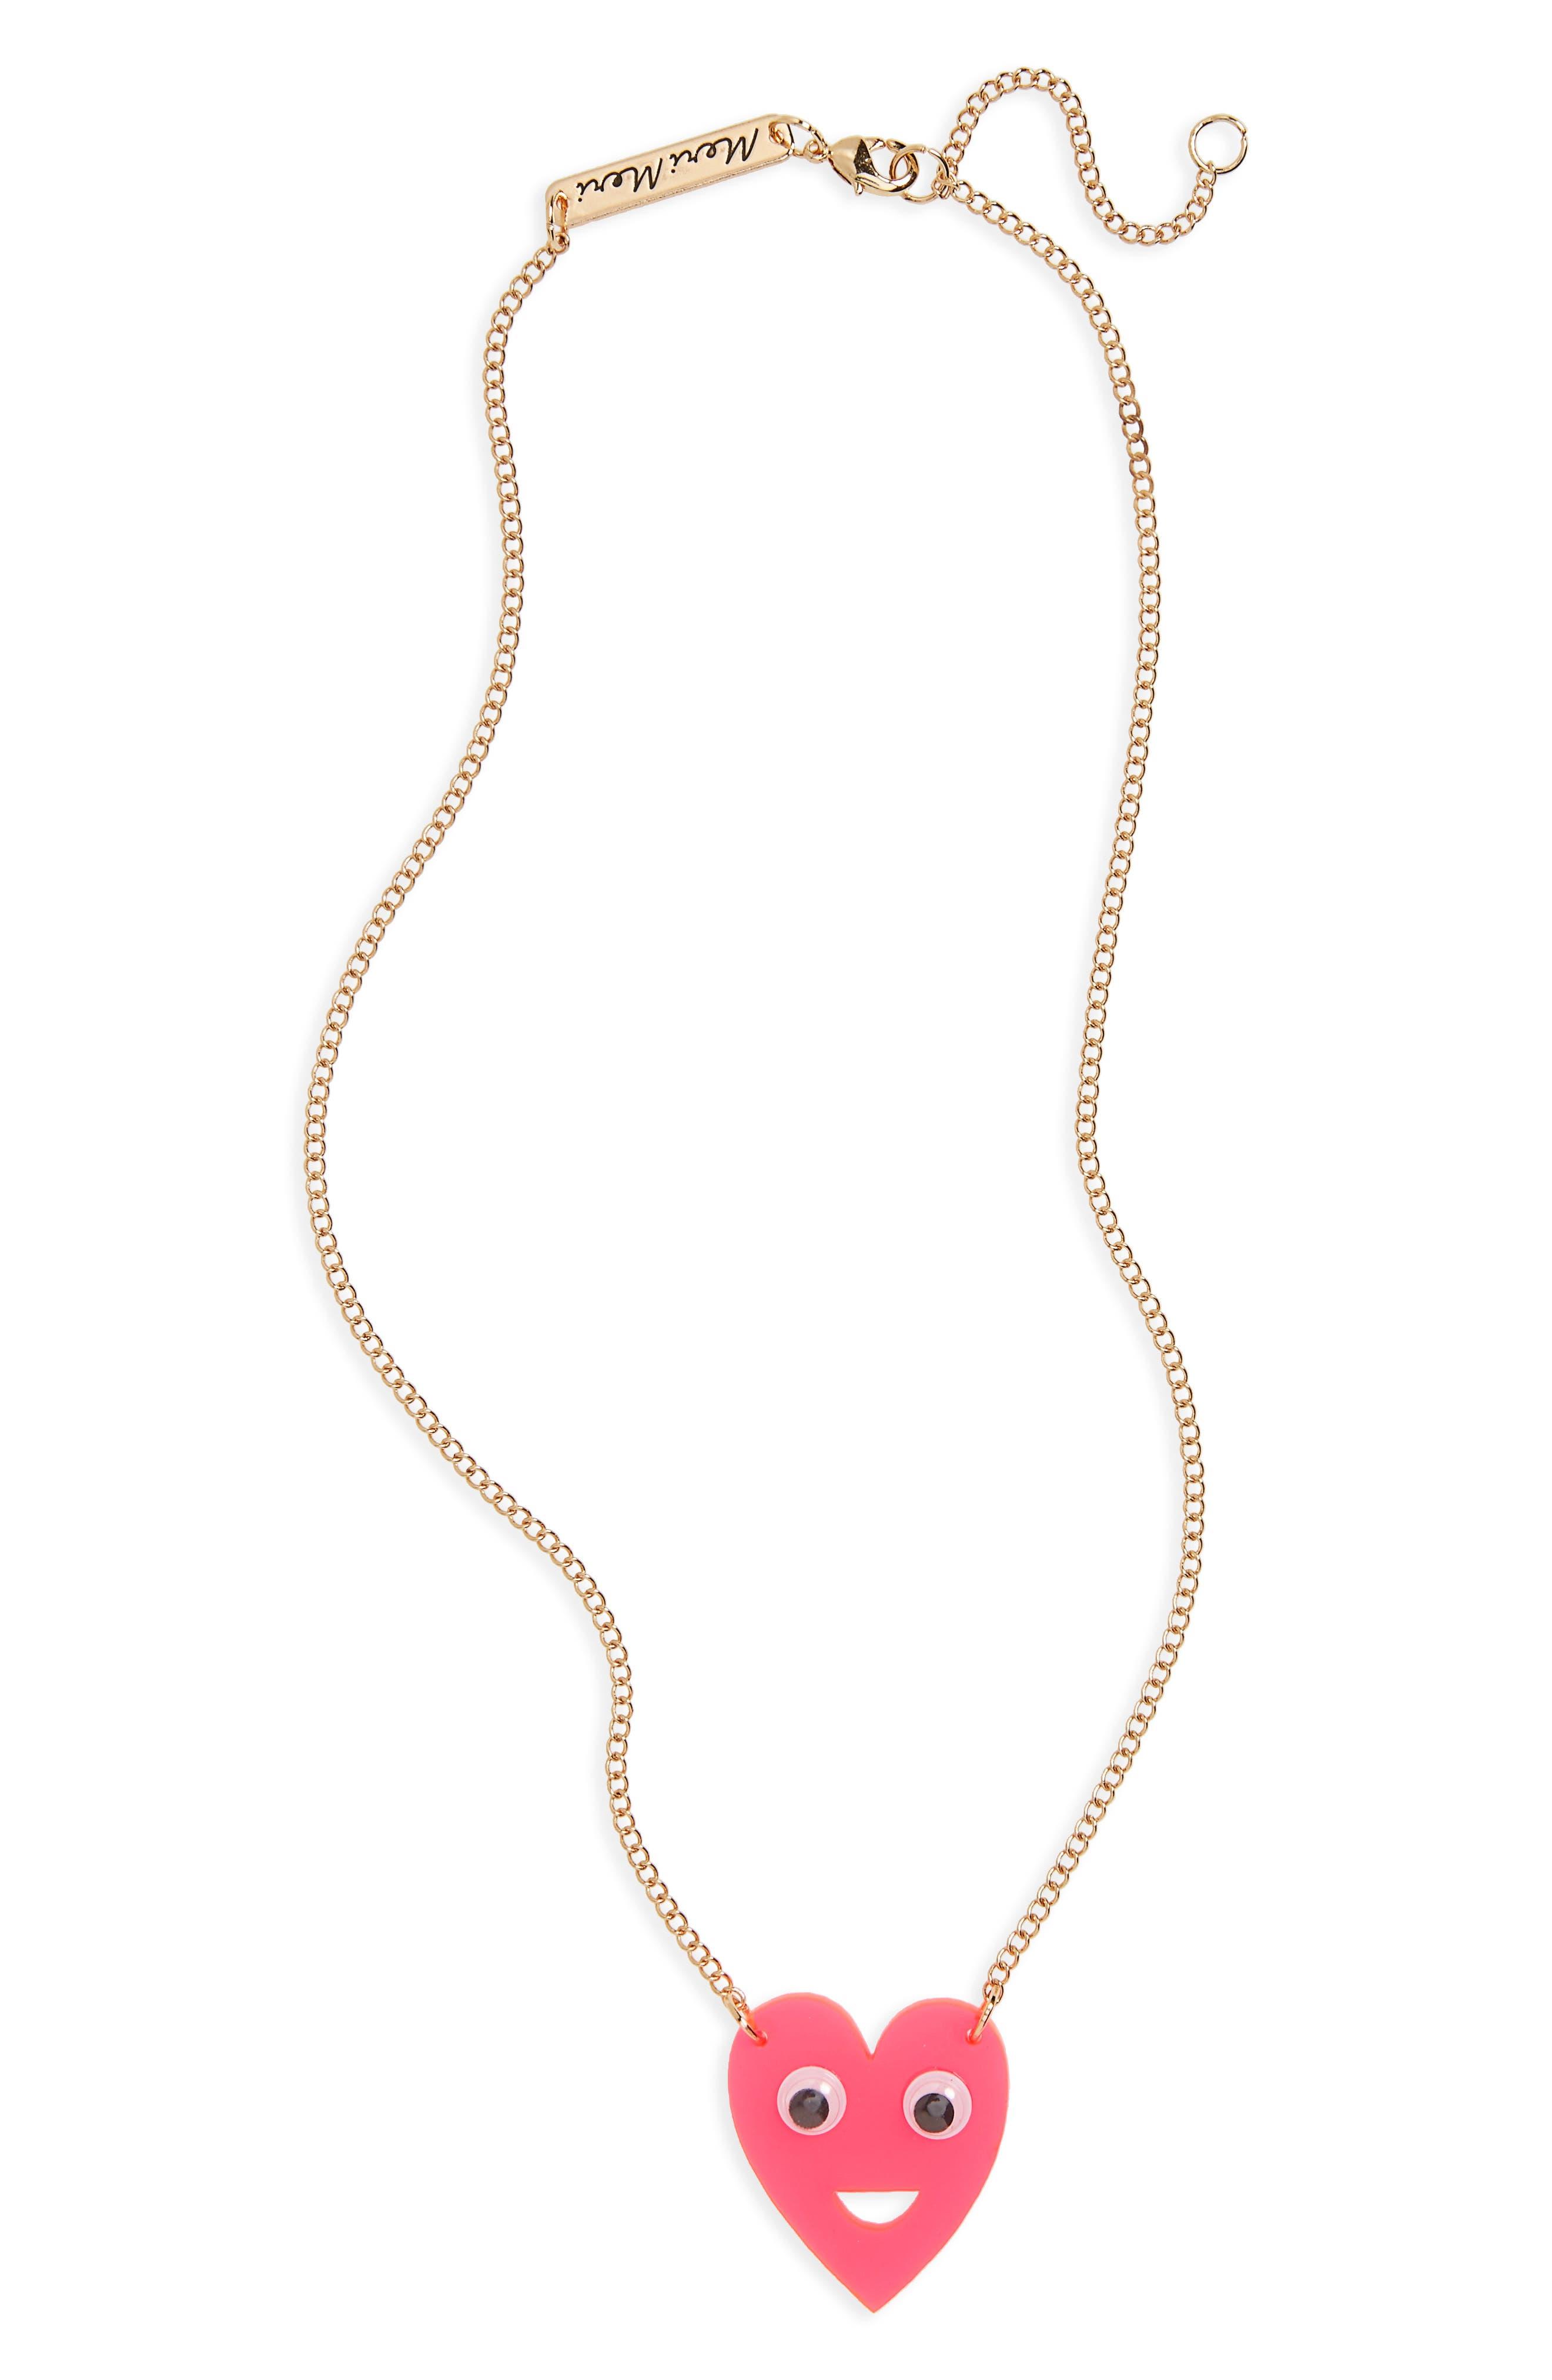 Main Image - Meri Meri Heart with Eyes Pendant Necklace (Girls)